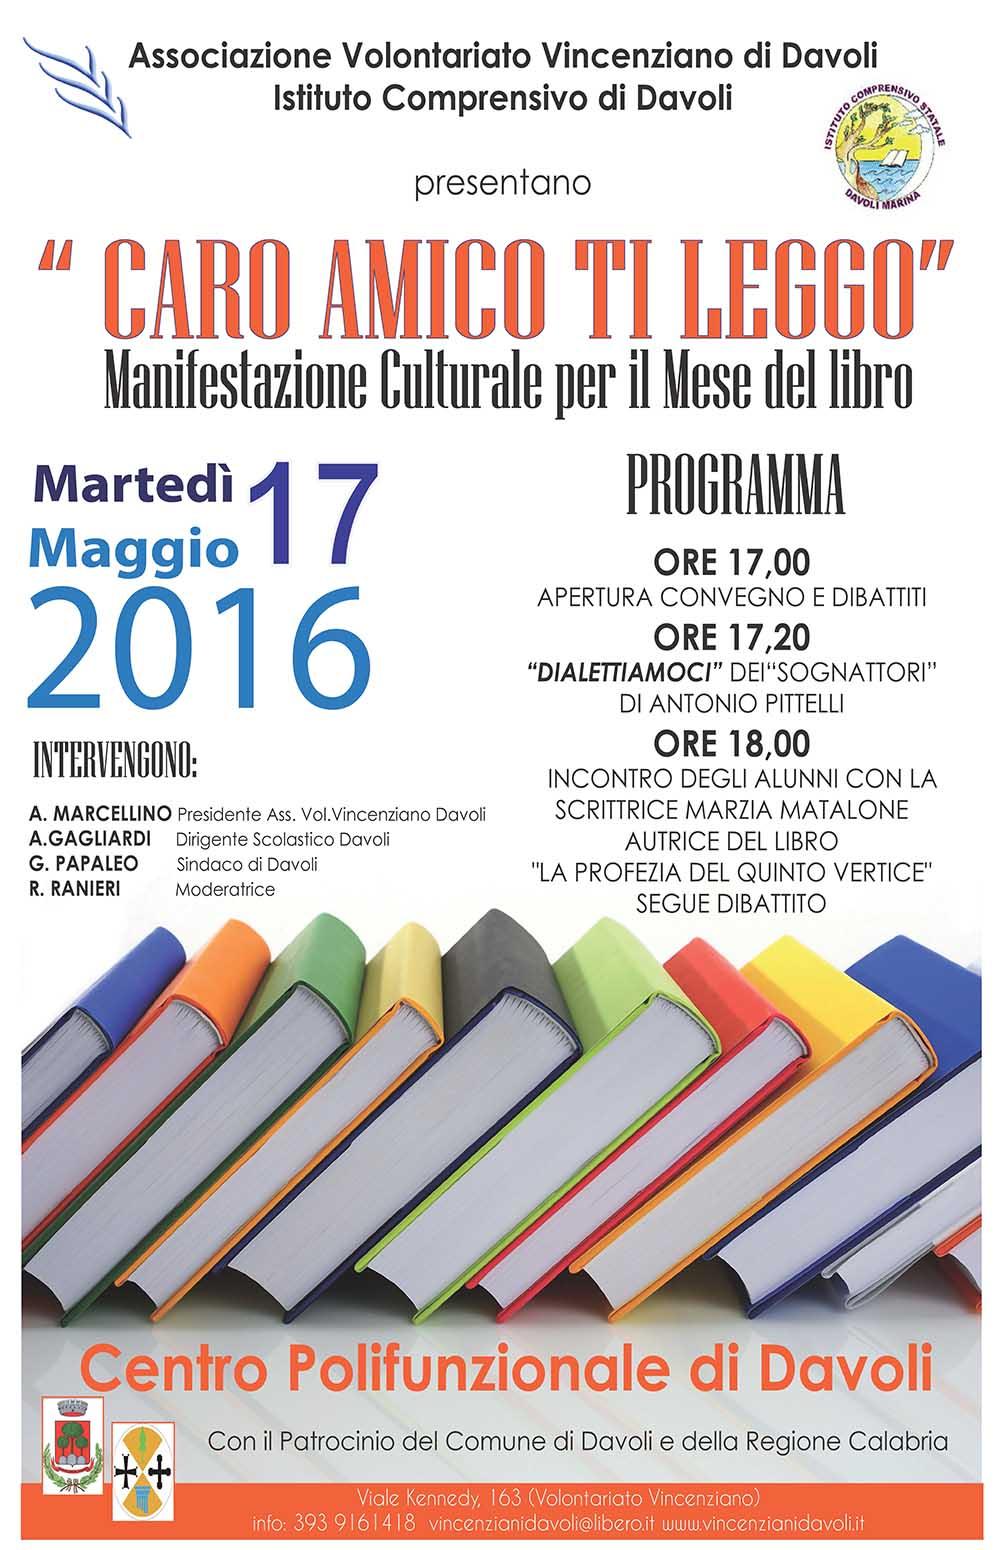 CARO AMICO TI LEGGO 2016